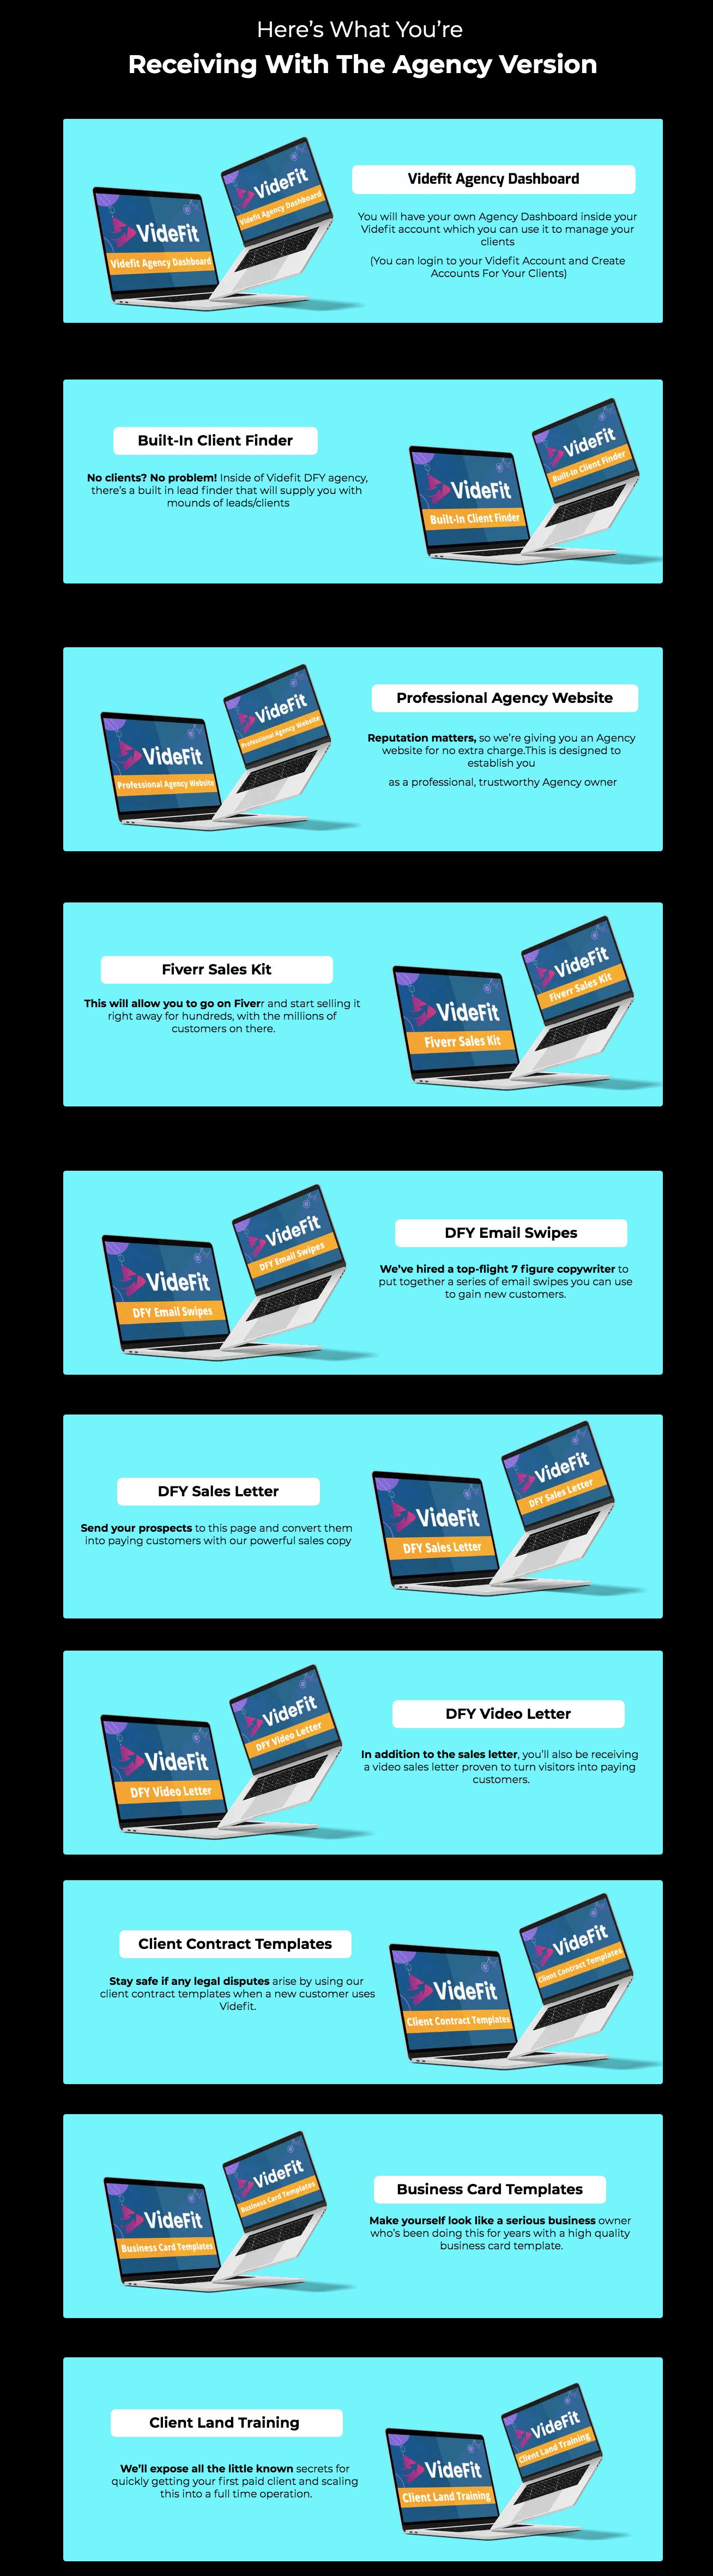 Videfit-OTO4-Features